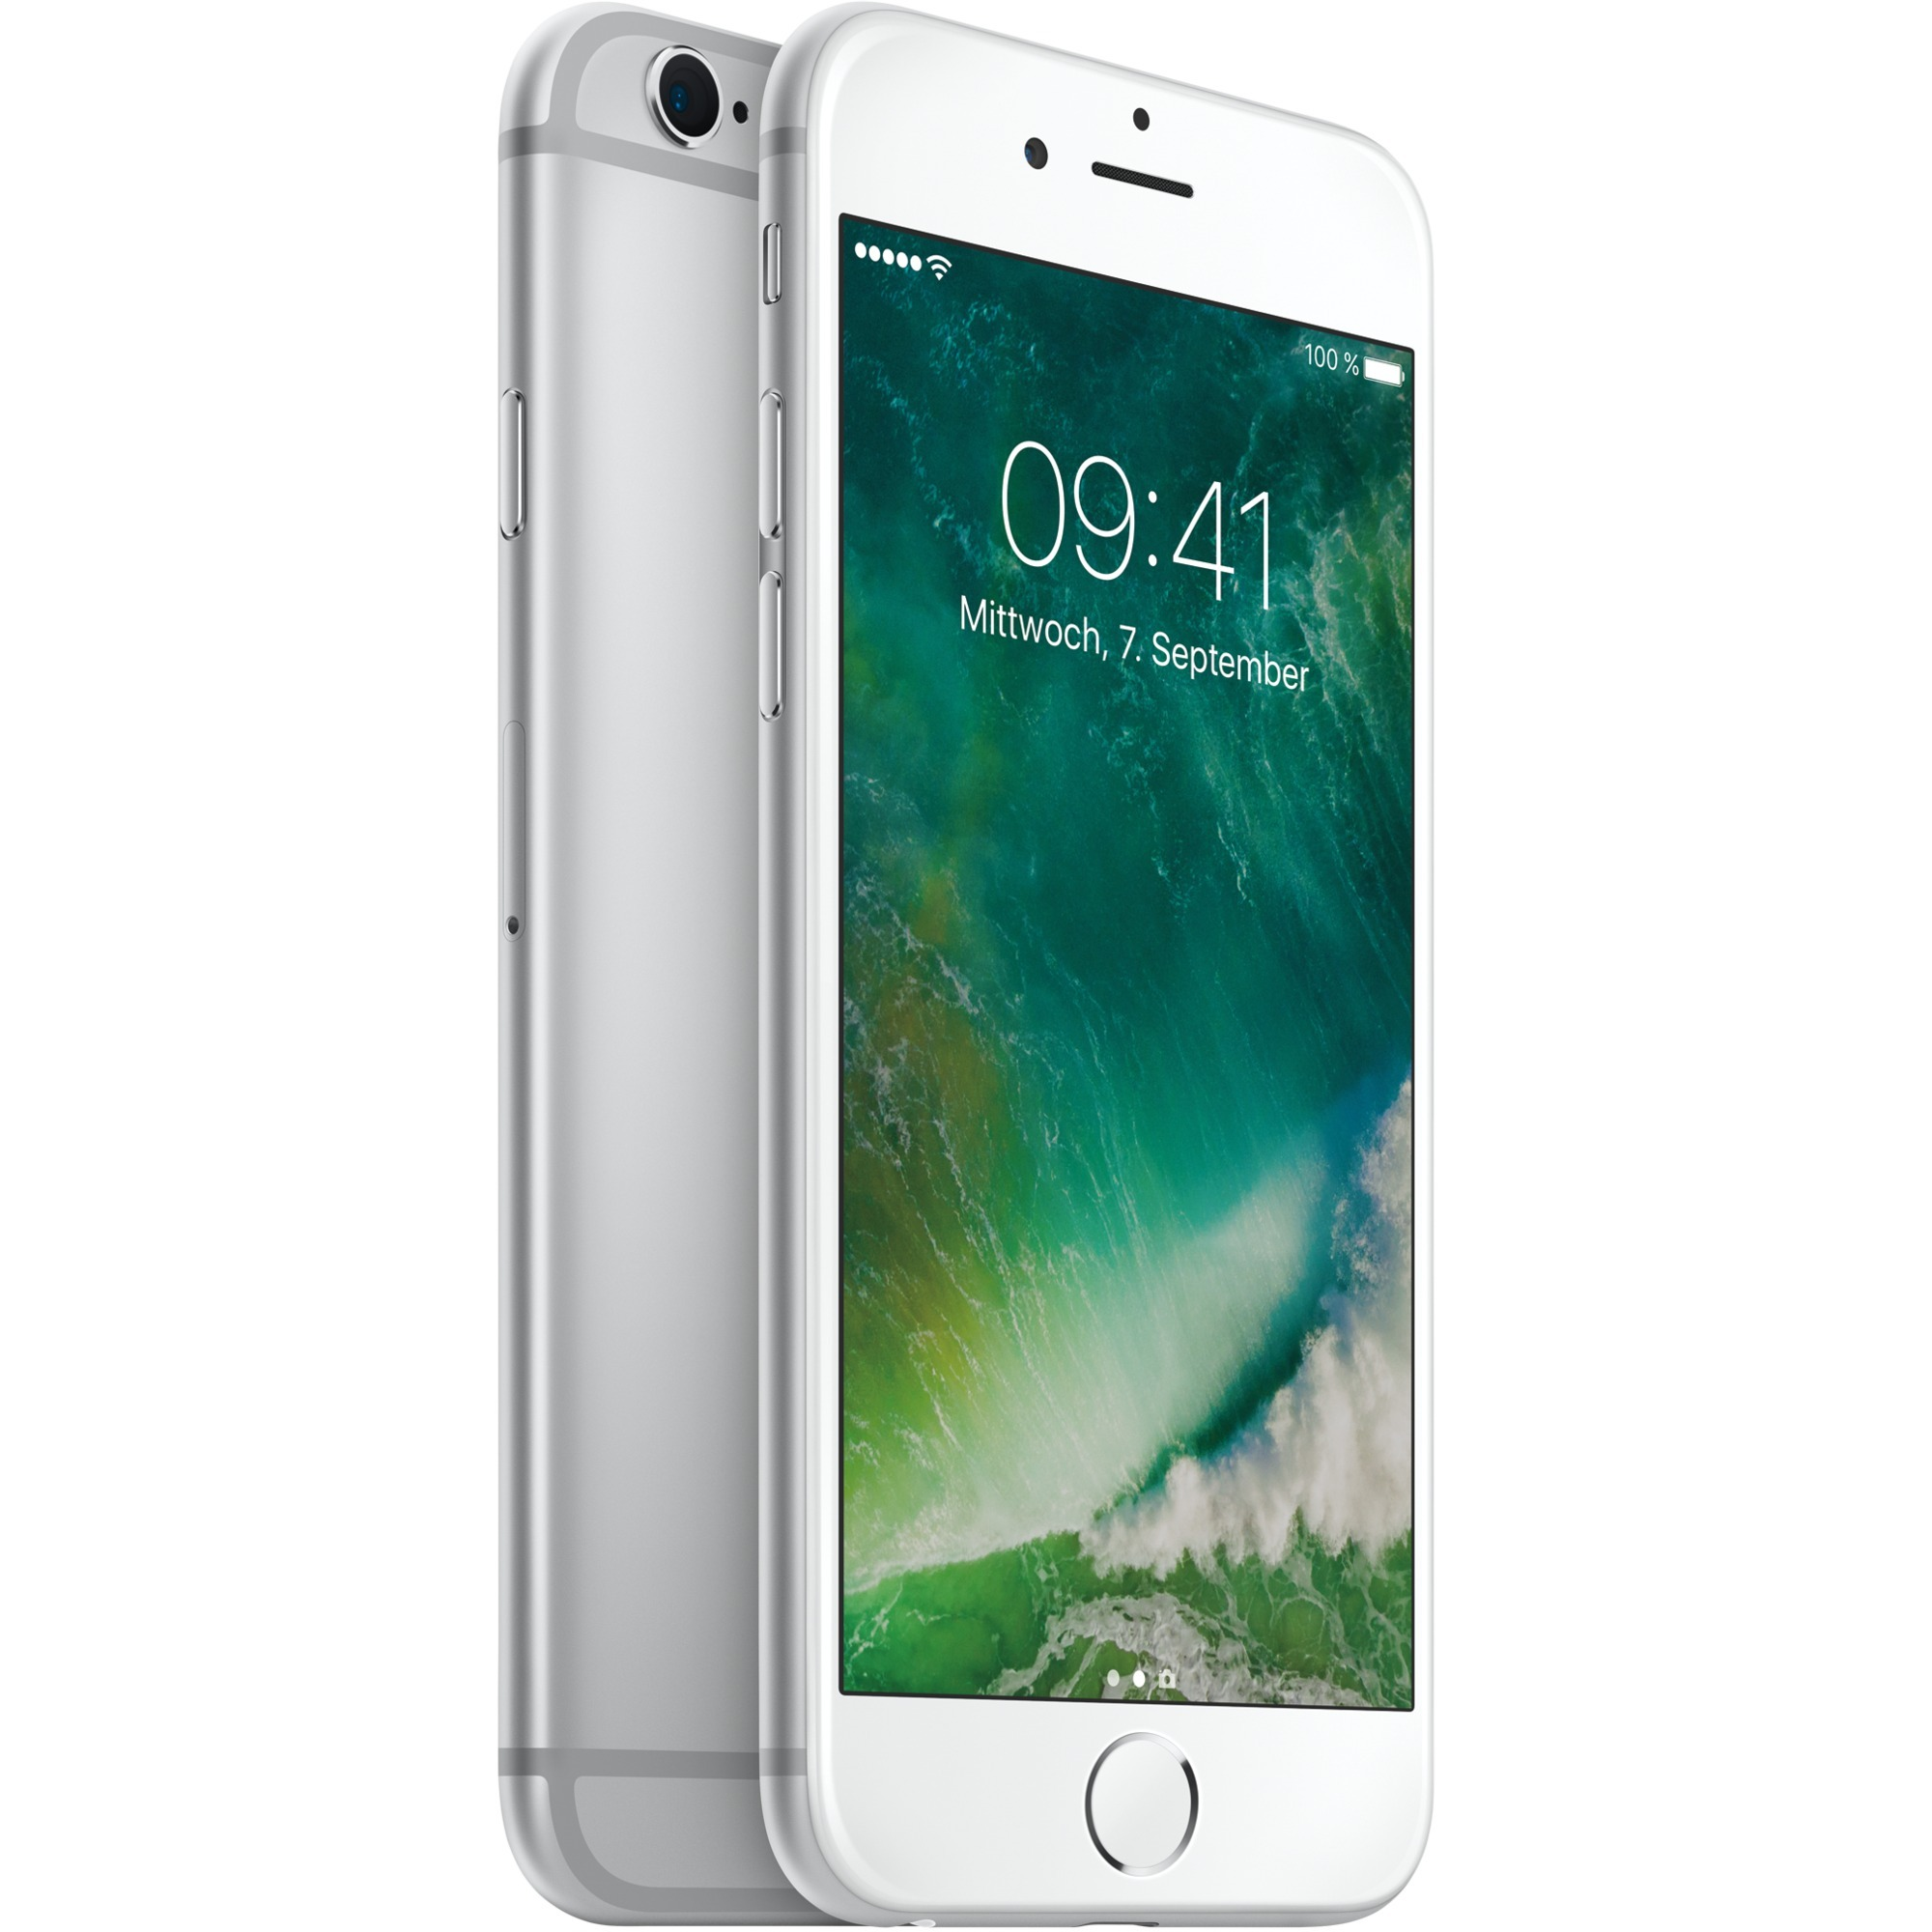 IPhone 6s 128GB, Mobiltelefon